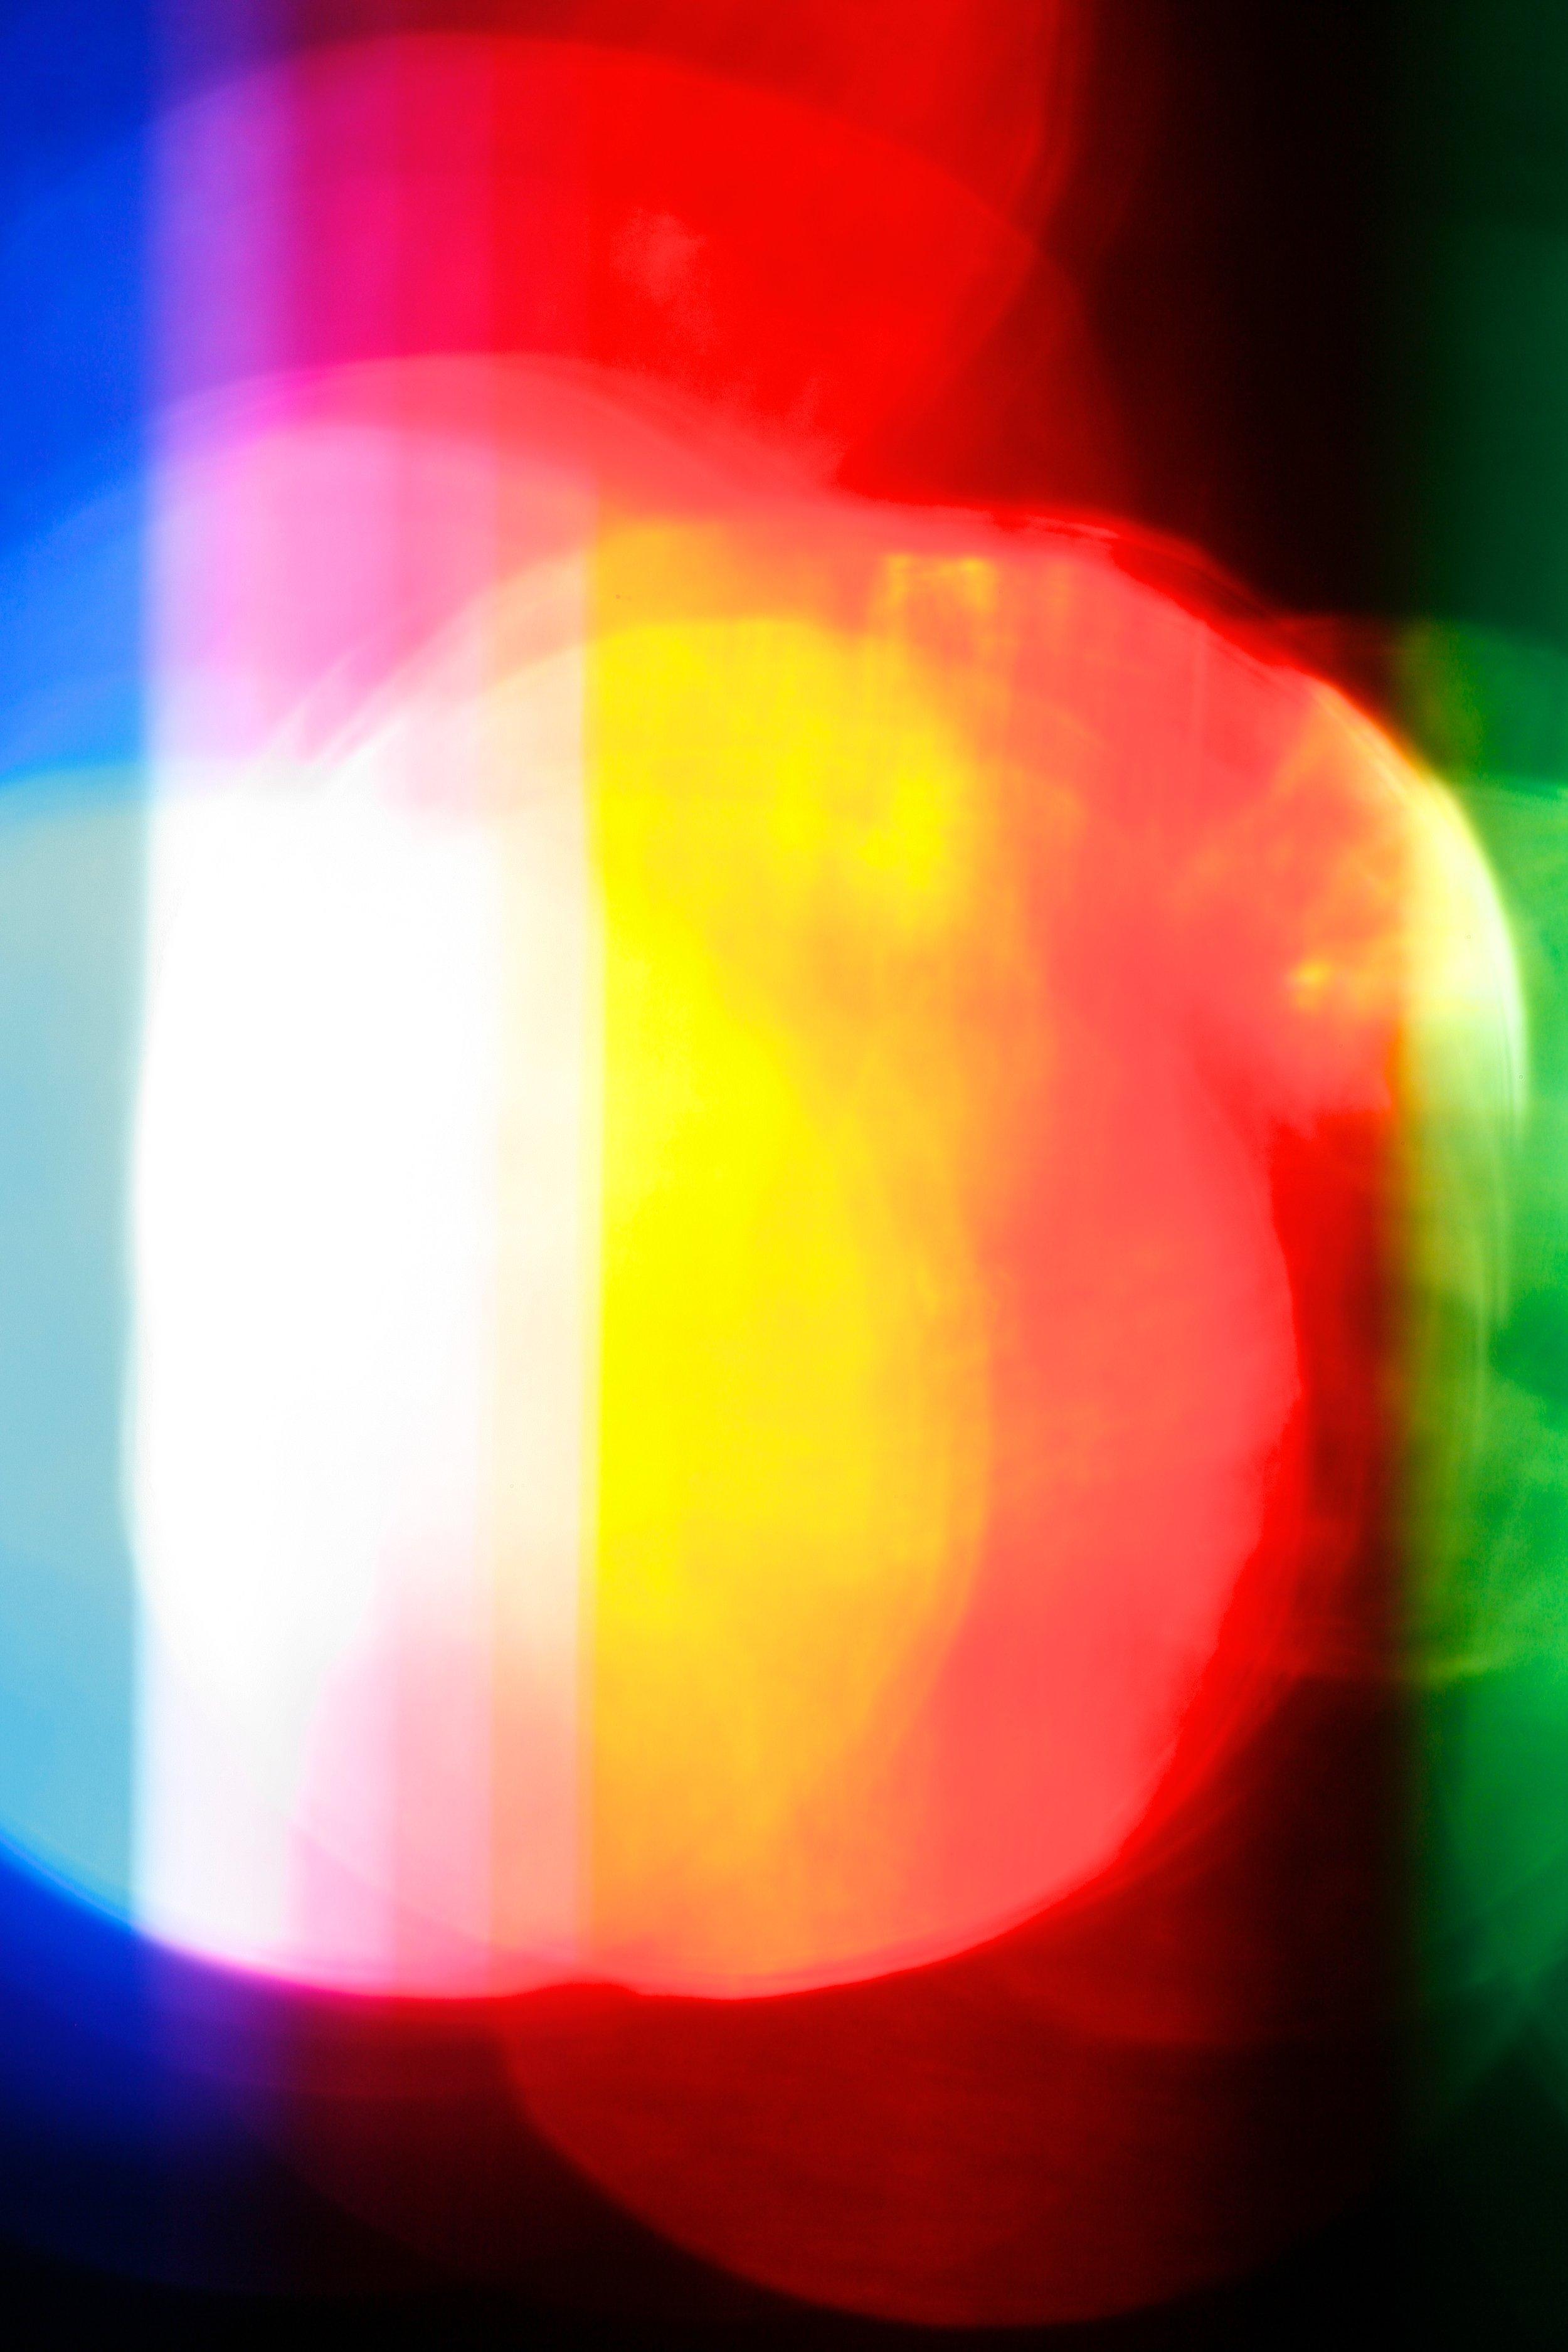 LED light through glass